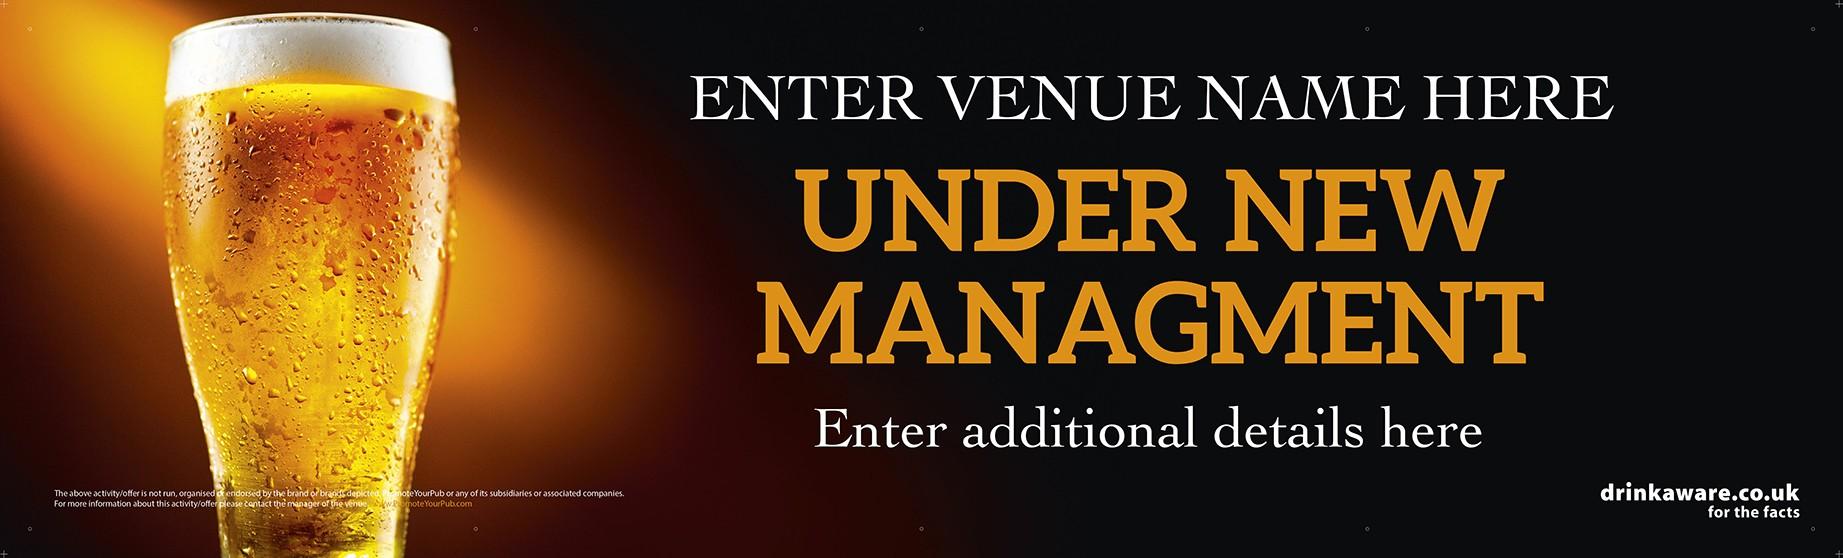 Under New Management Banner v2